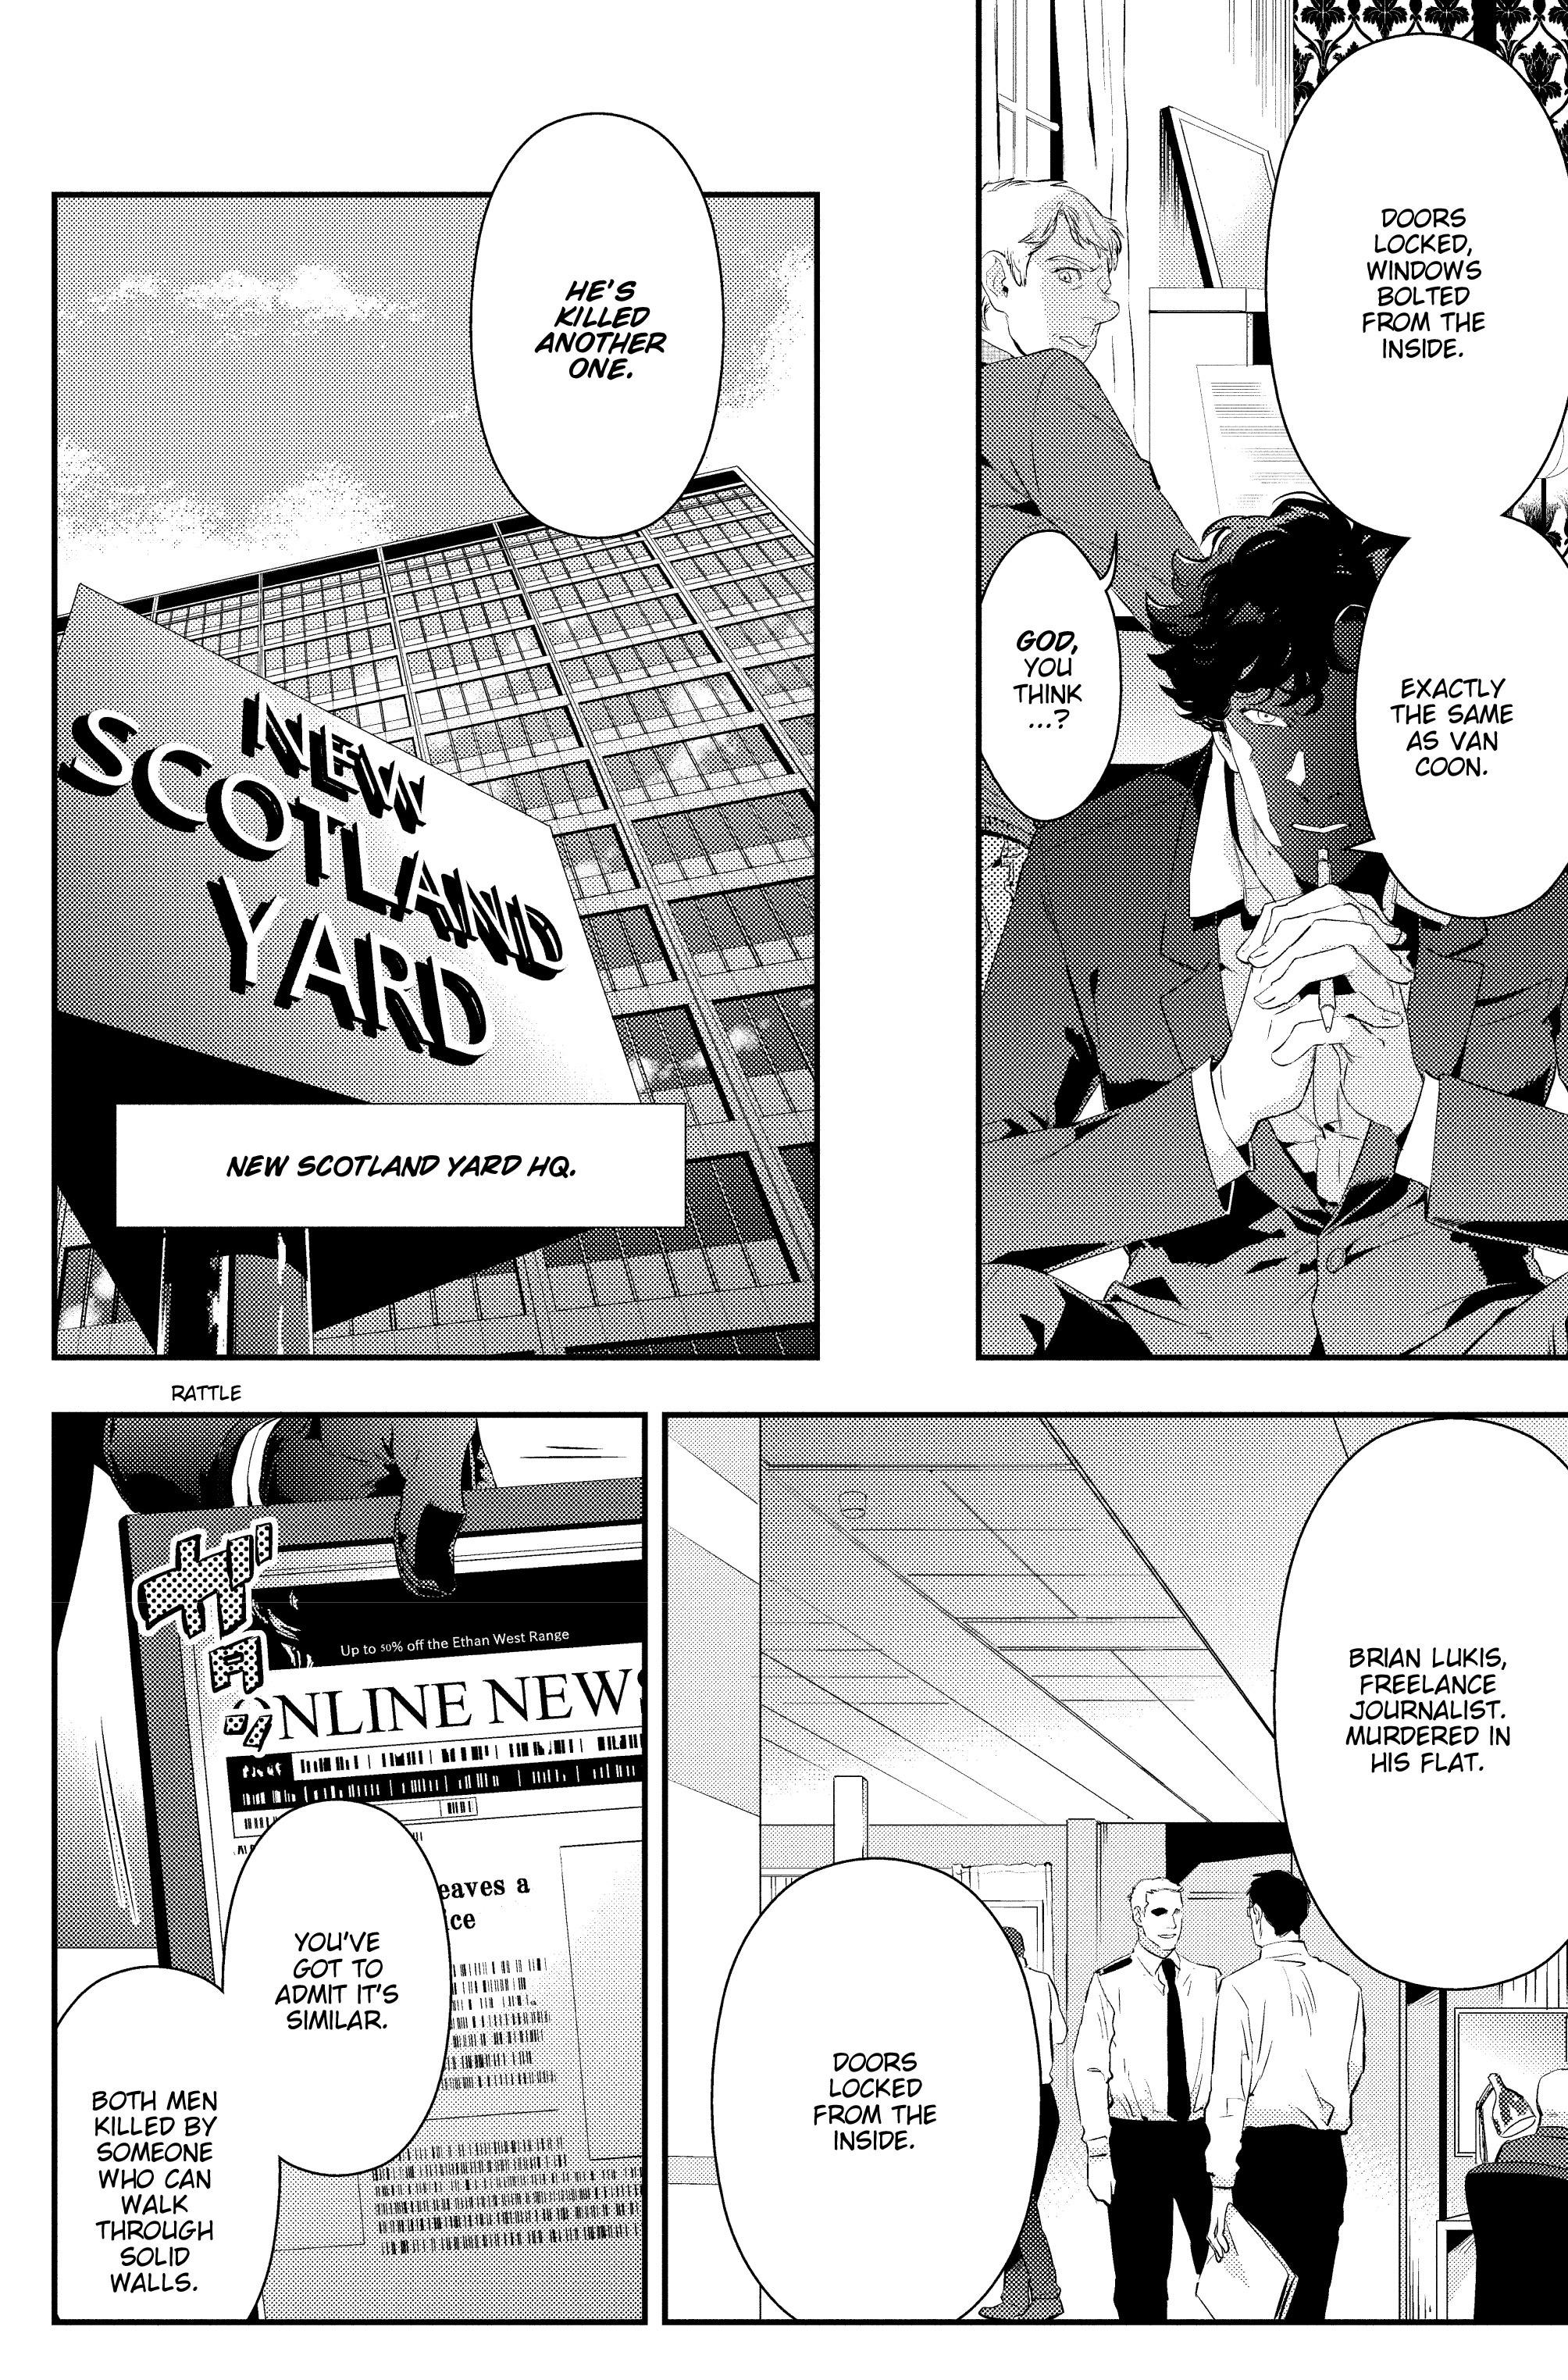 Read online Sherlock: The Blind Banker comic -  Issue #2 - 29